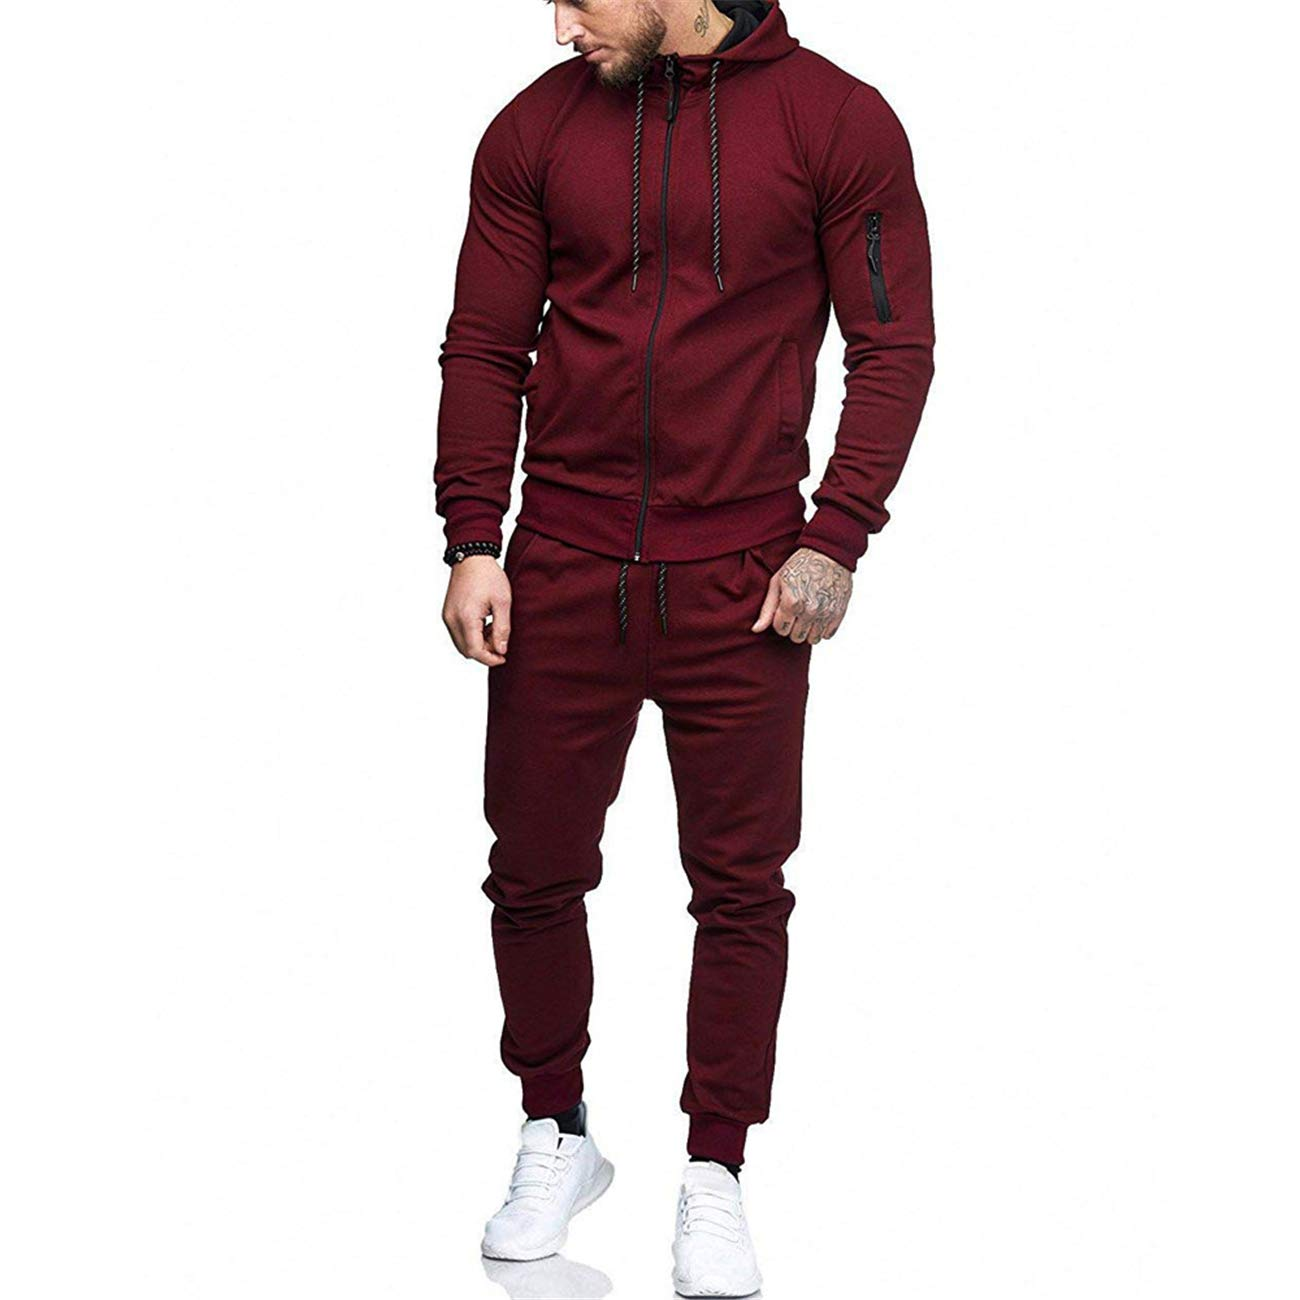 Rosennie Mens Tracksuit,Men Autumn Winter Fashion Casual Hooded Warm Long Sleeve Padded Velvet Outwear Sport Loose Pocket Slim Patchwork Zipper Sweatshirt Top Pants Sets Sports Suit